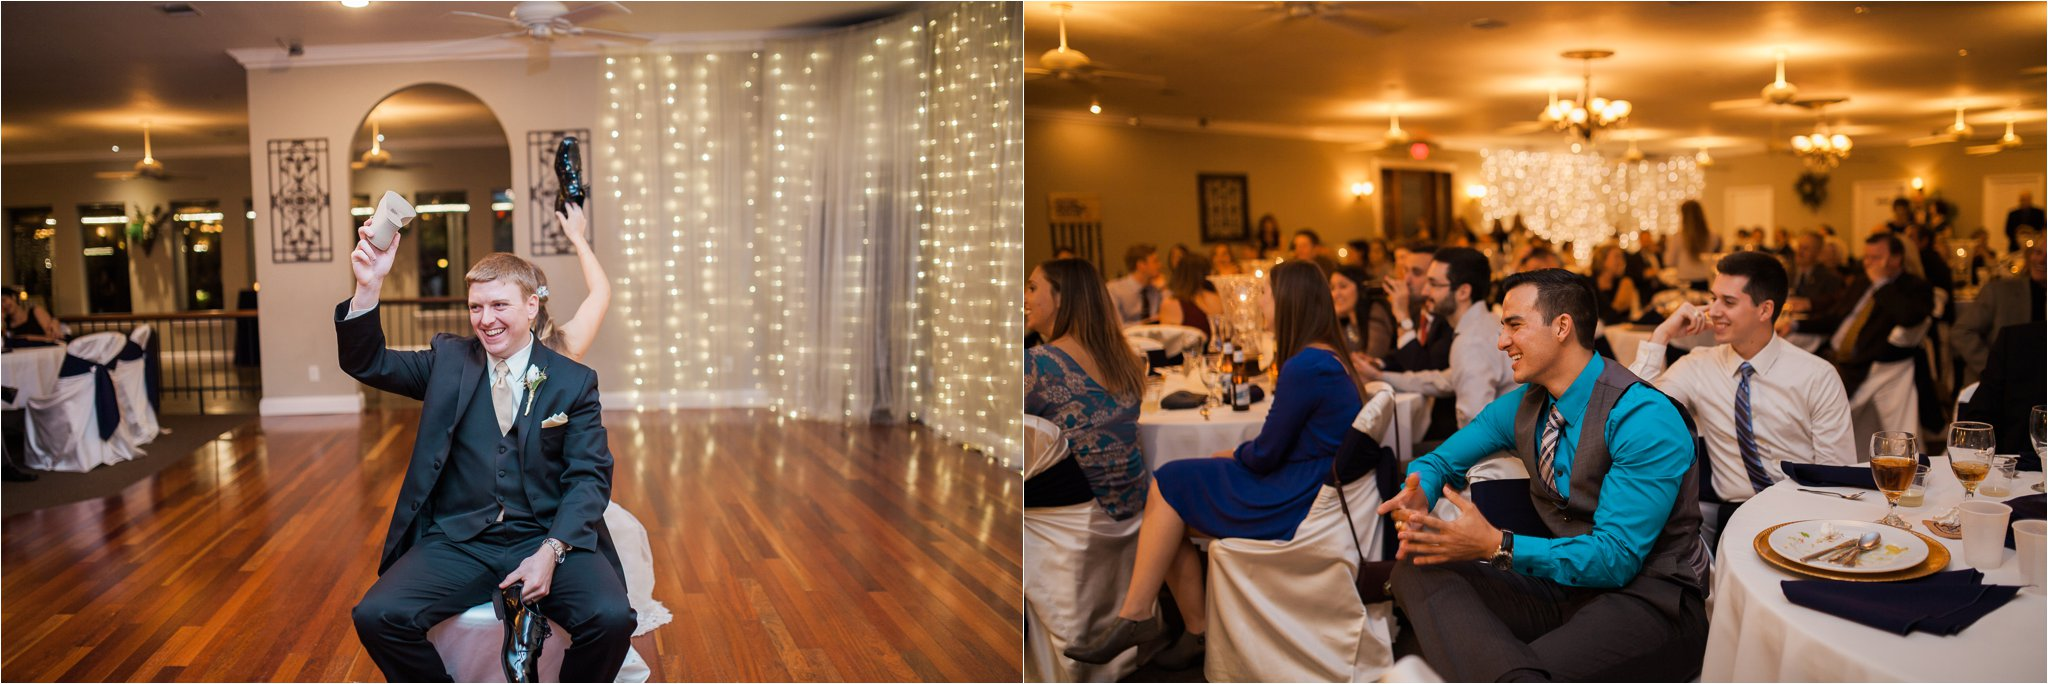 lunsford-wedding-876.jpg